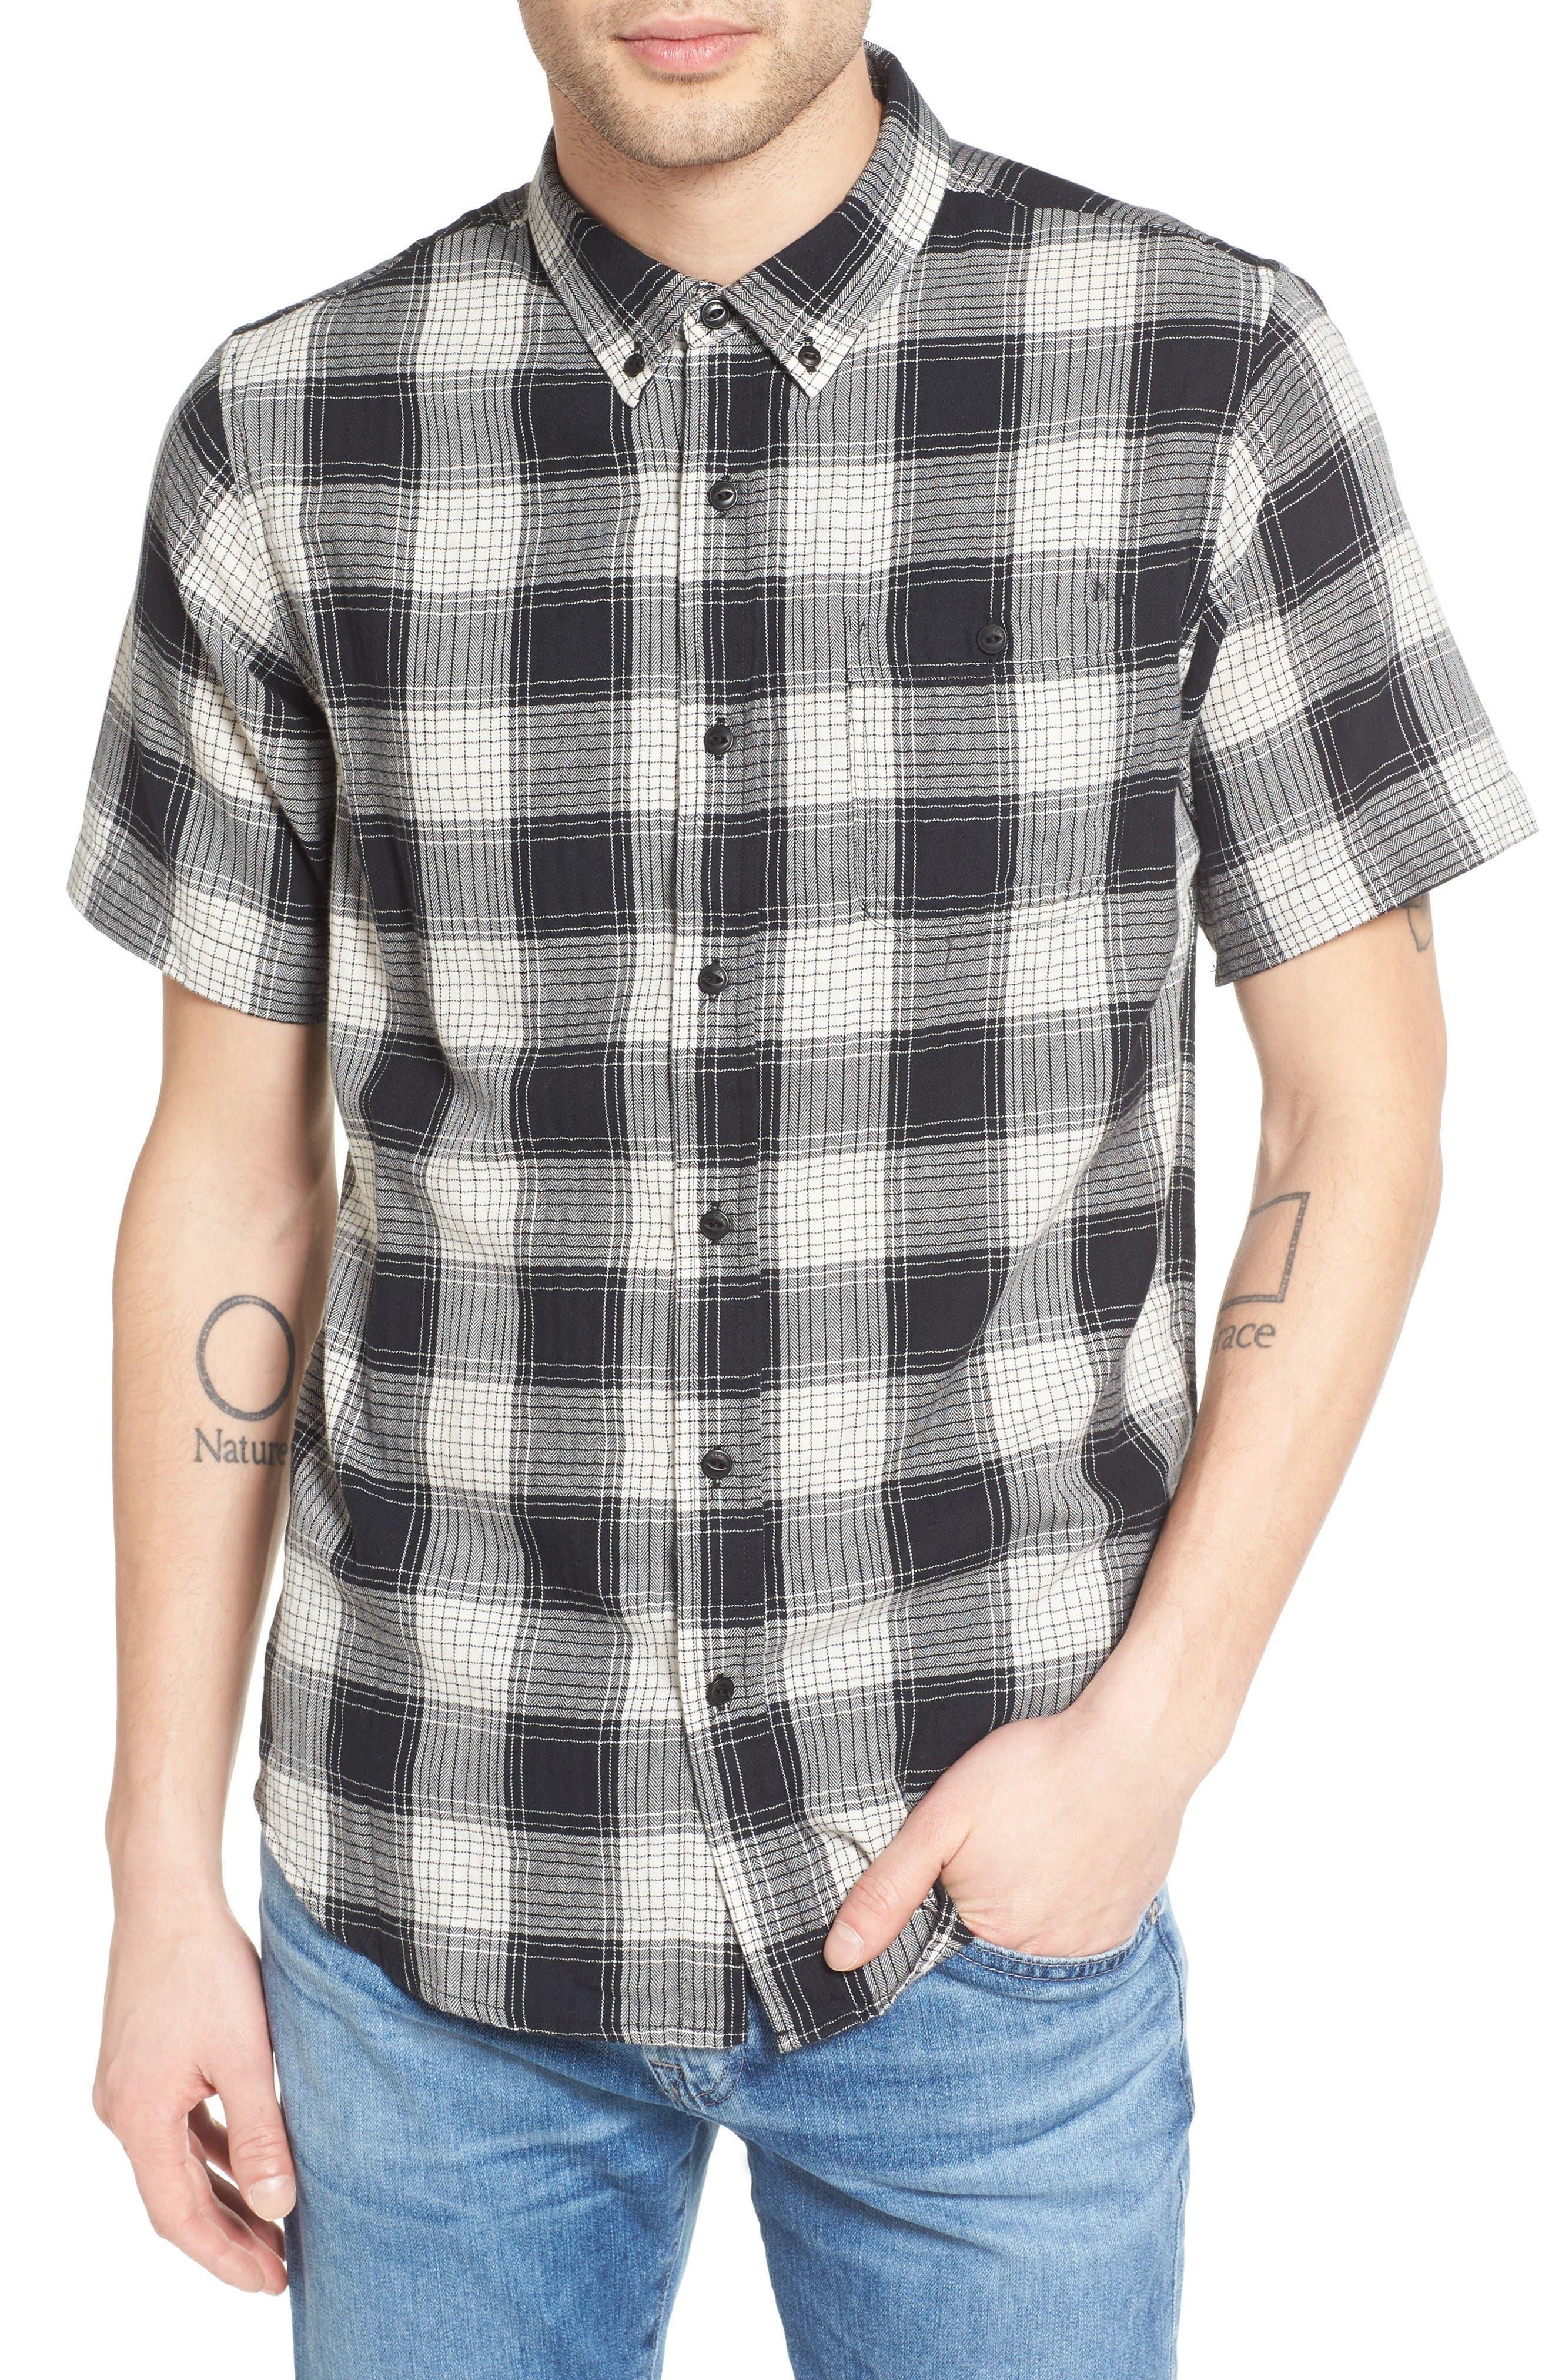 Main Image - Ezekiel Herringbone Woven Plaid Shirt